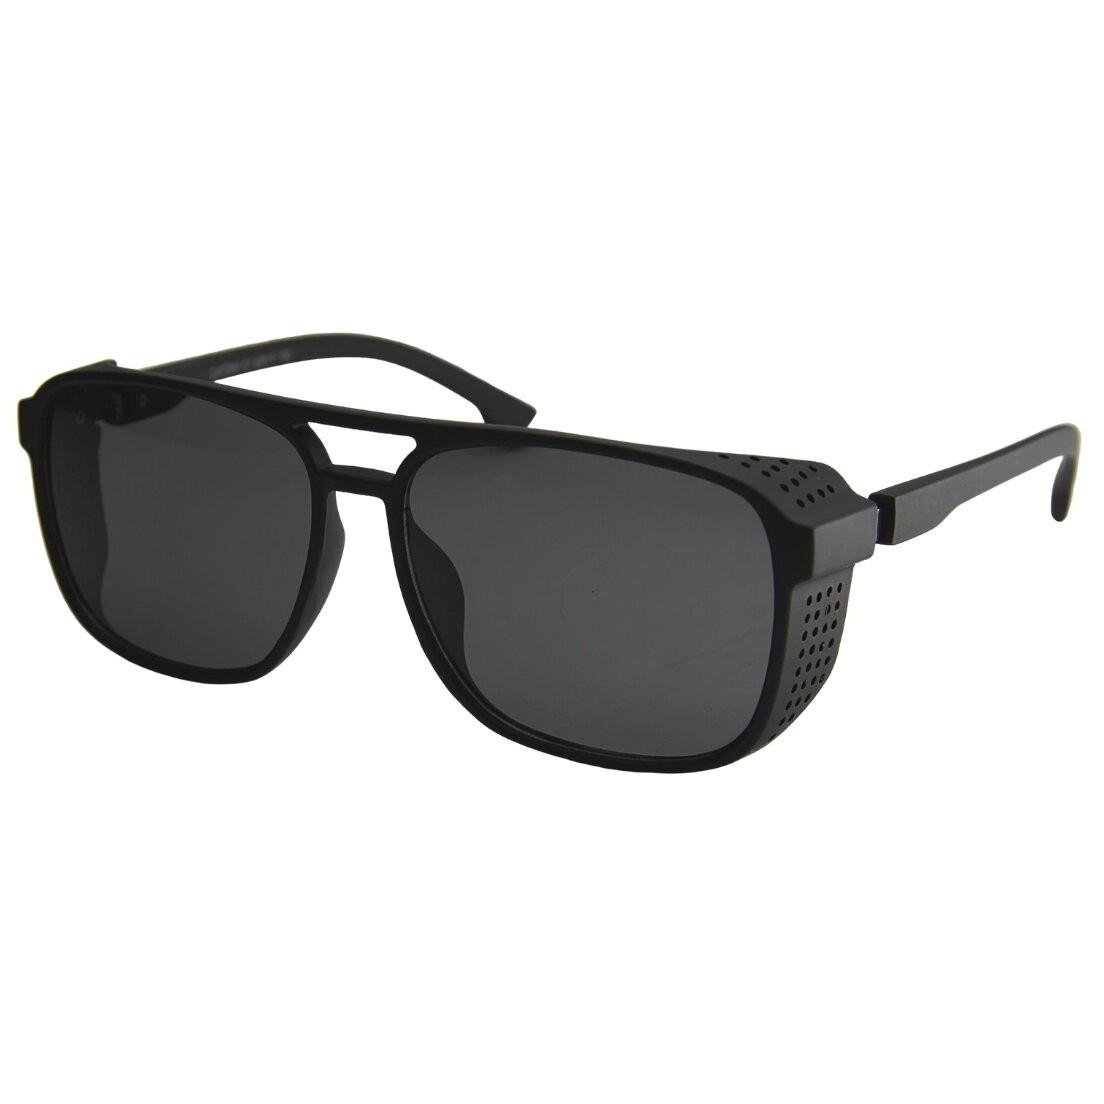 Óculos de Sol Khatto Square Veloz Italiano - C058